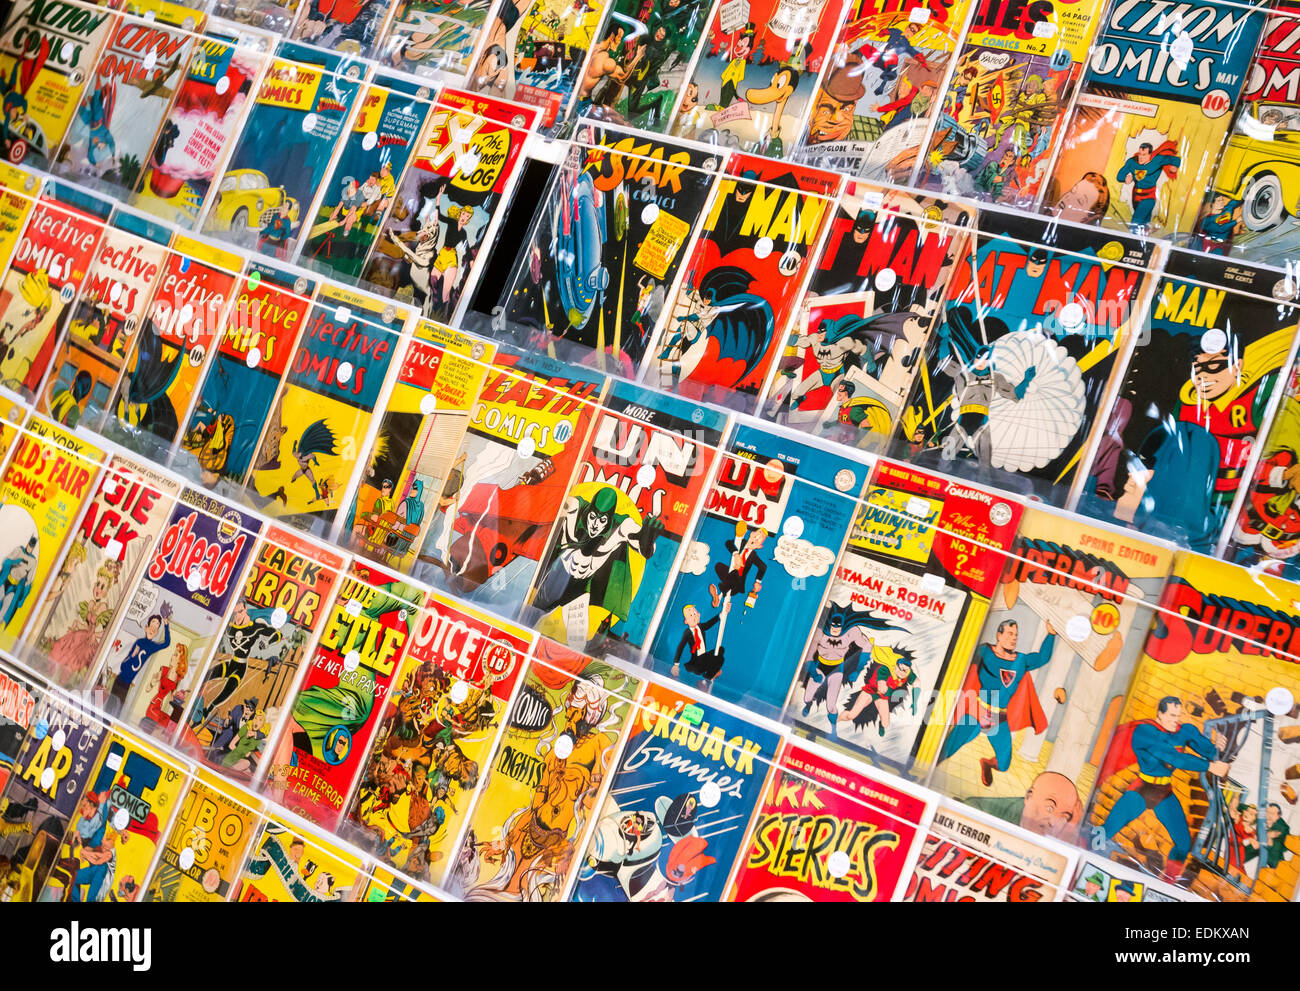 Superhero Comic Books - Stock Image